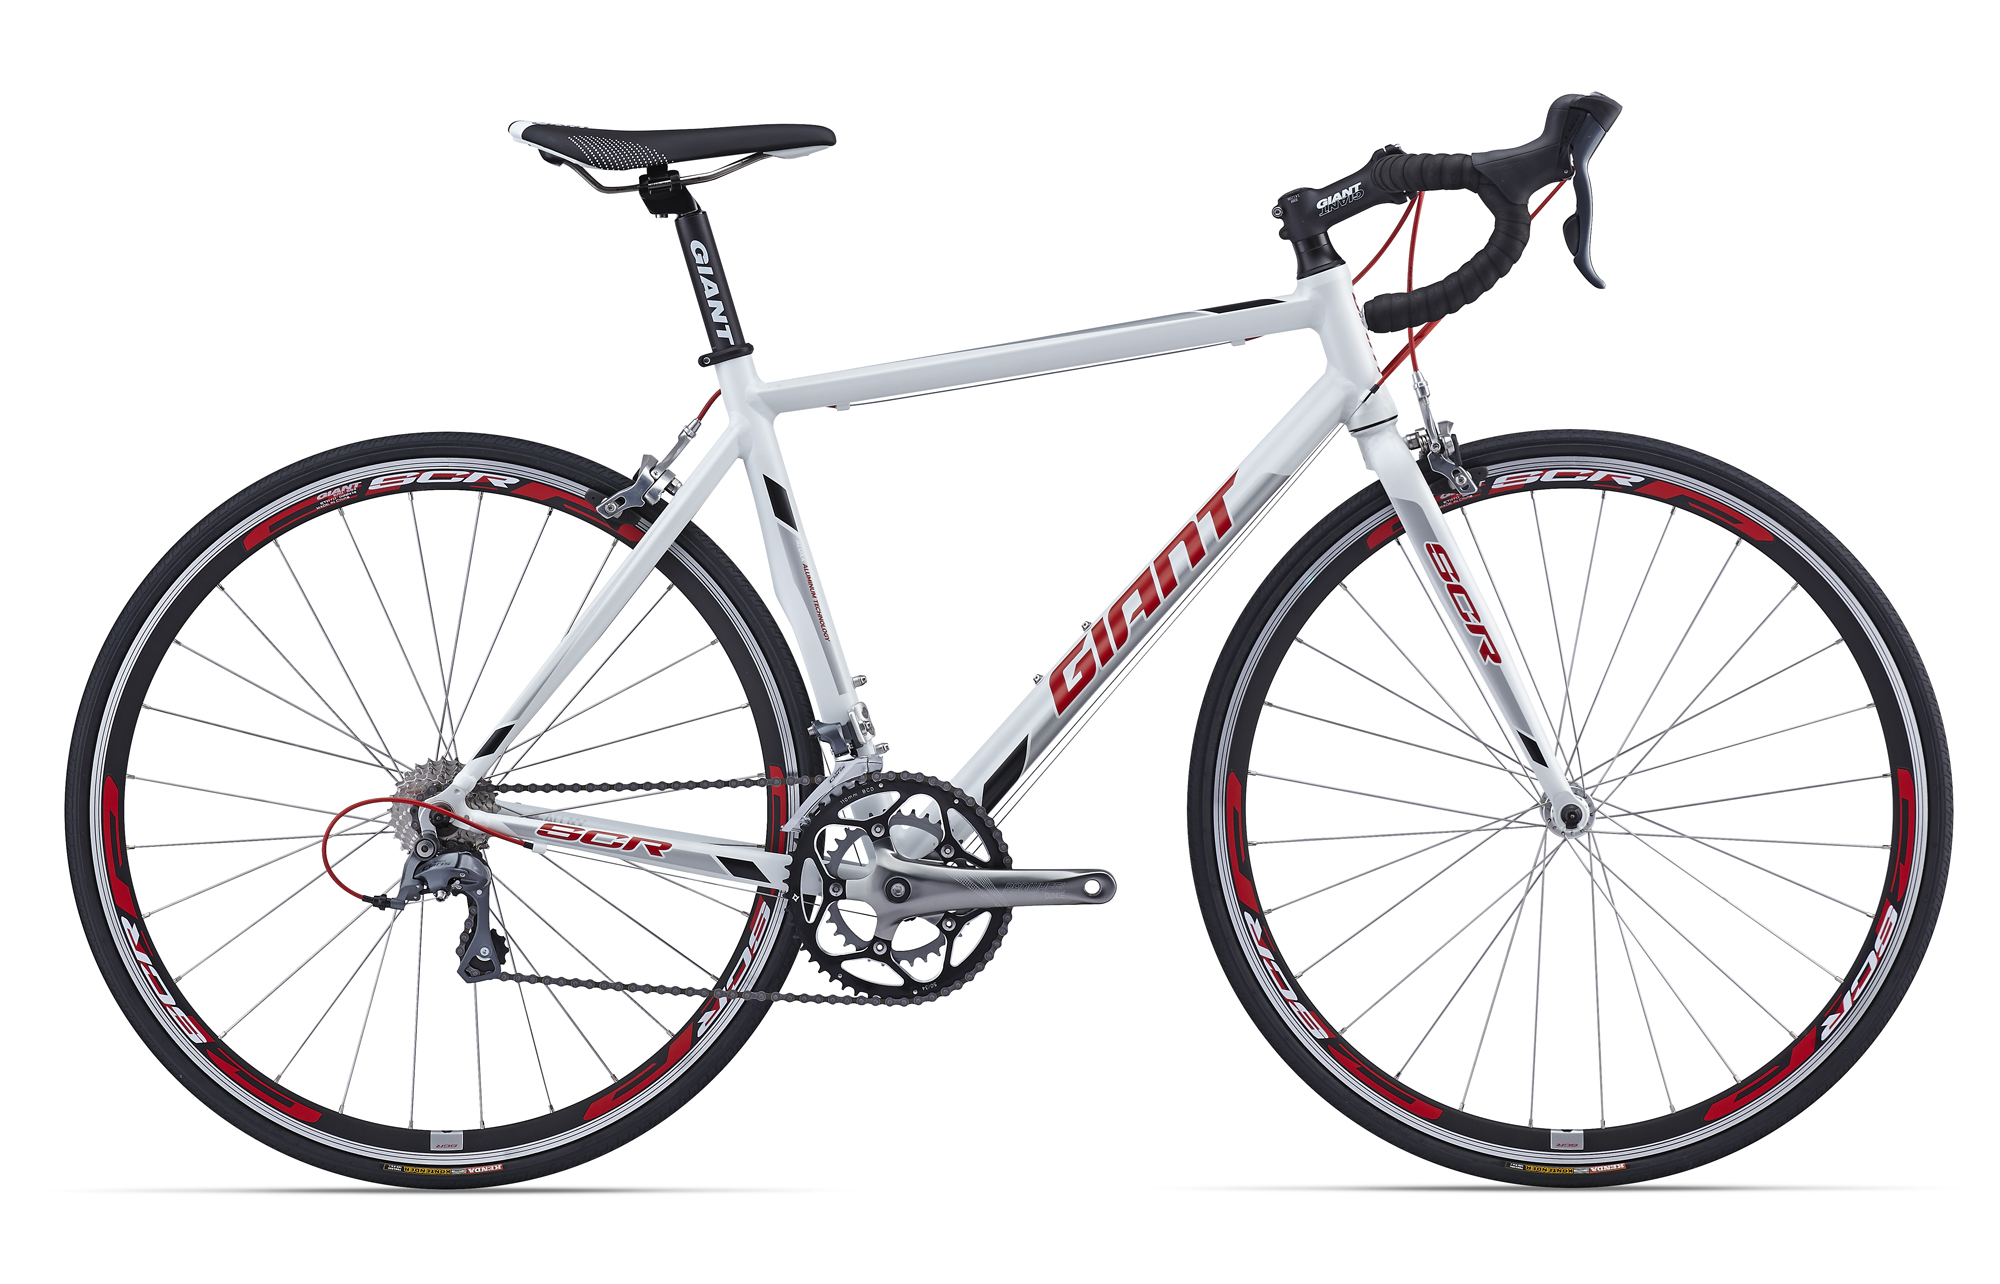 Велосипед SCR 2 Колесо:700c Рама:S Цвет:БелыйВелосипеды<br><br><br>Артикул: 61010313<br>Бренд: Giant<br>Возрастная группа: взрослый<br>Пол: мужской